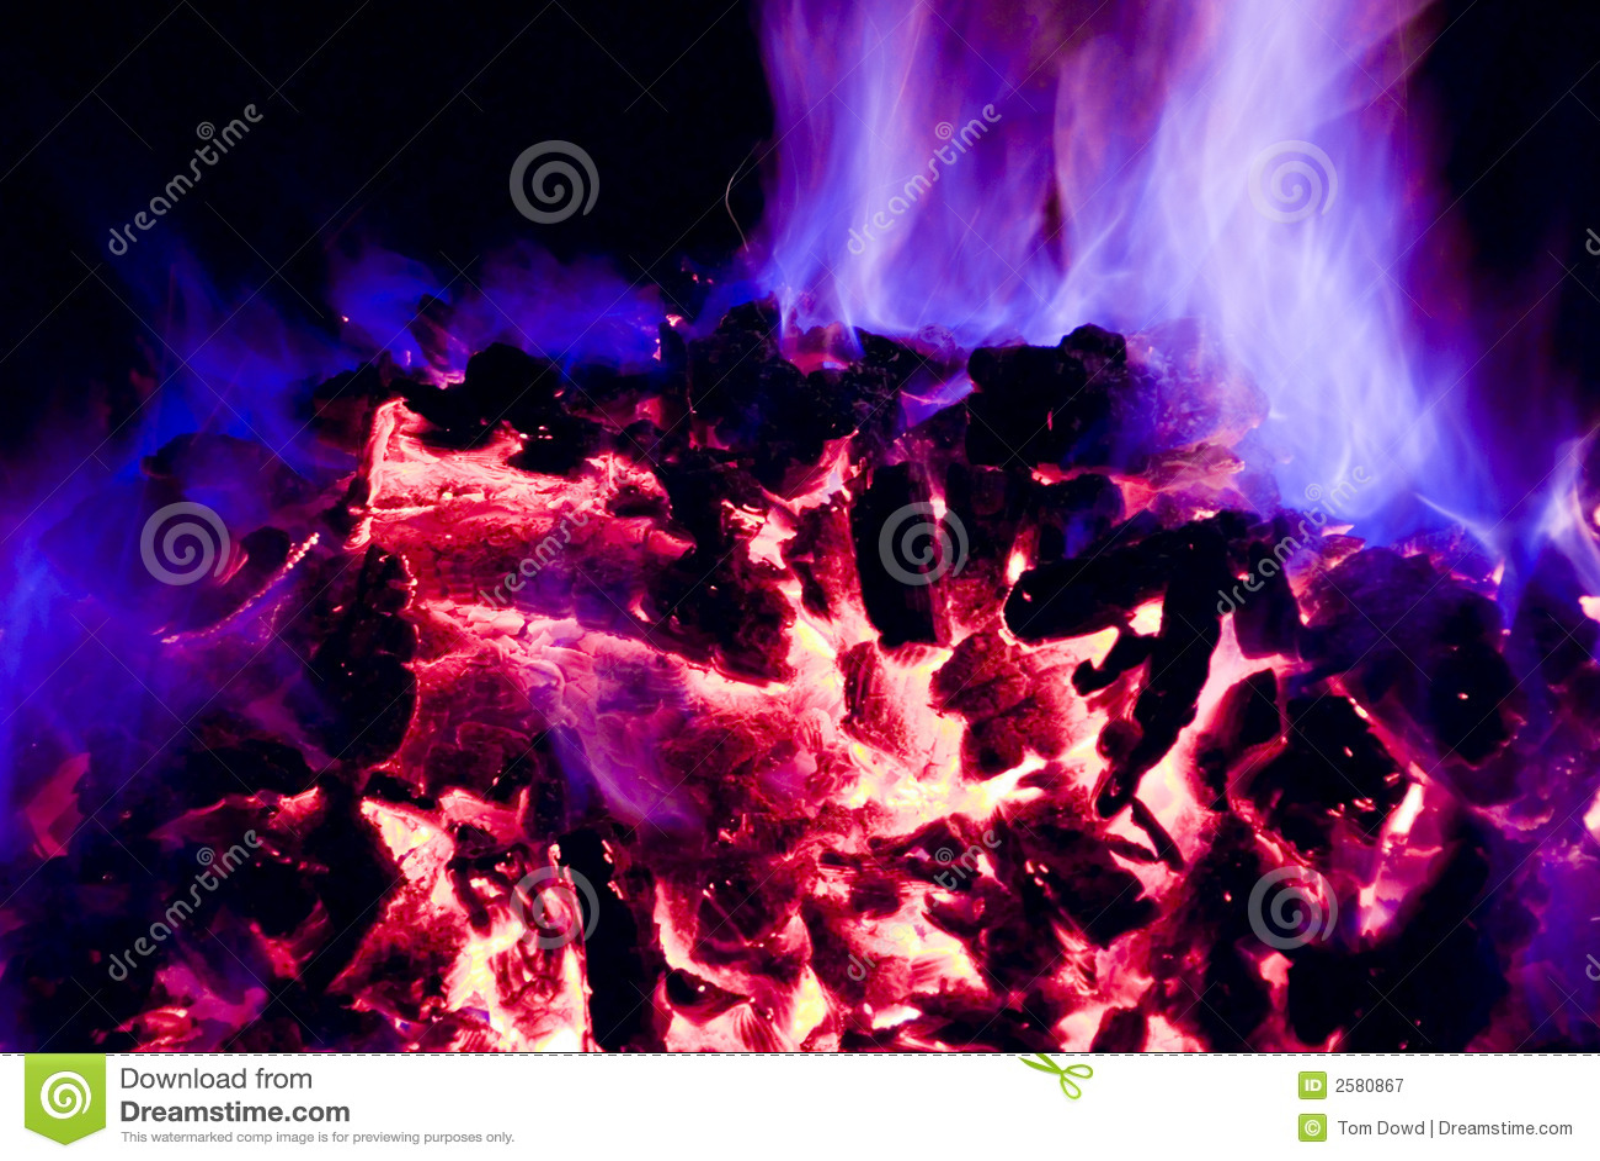 Purpere en Blauwe Vlammen van Brand